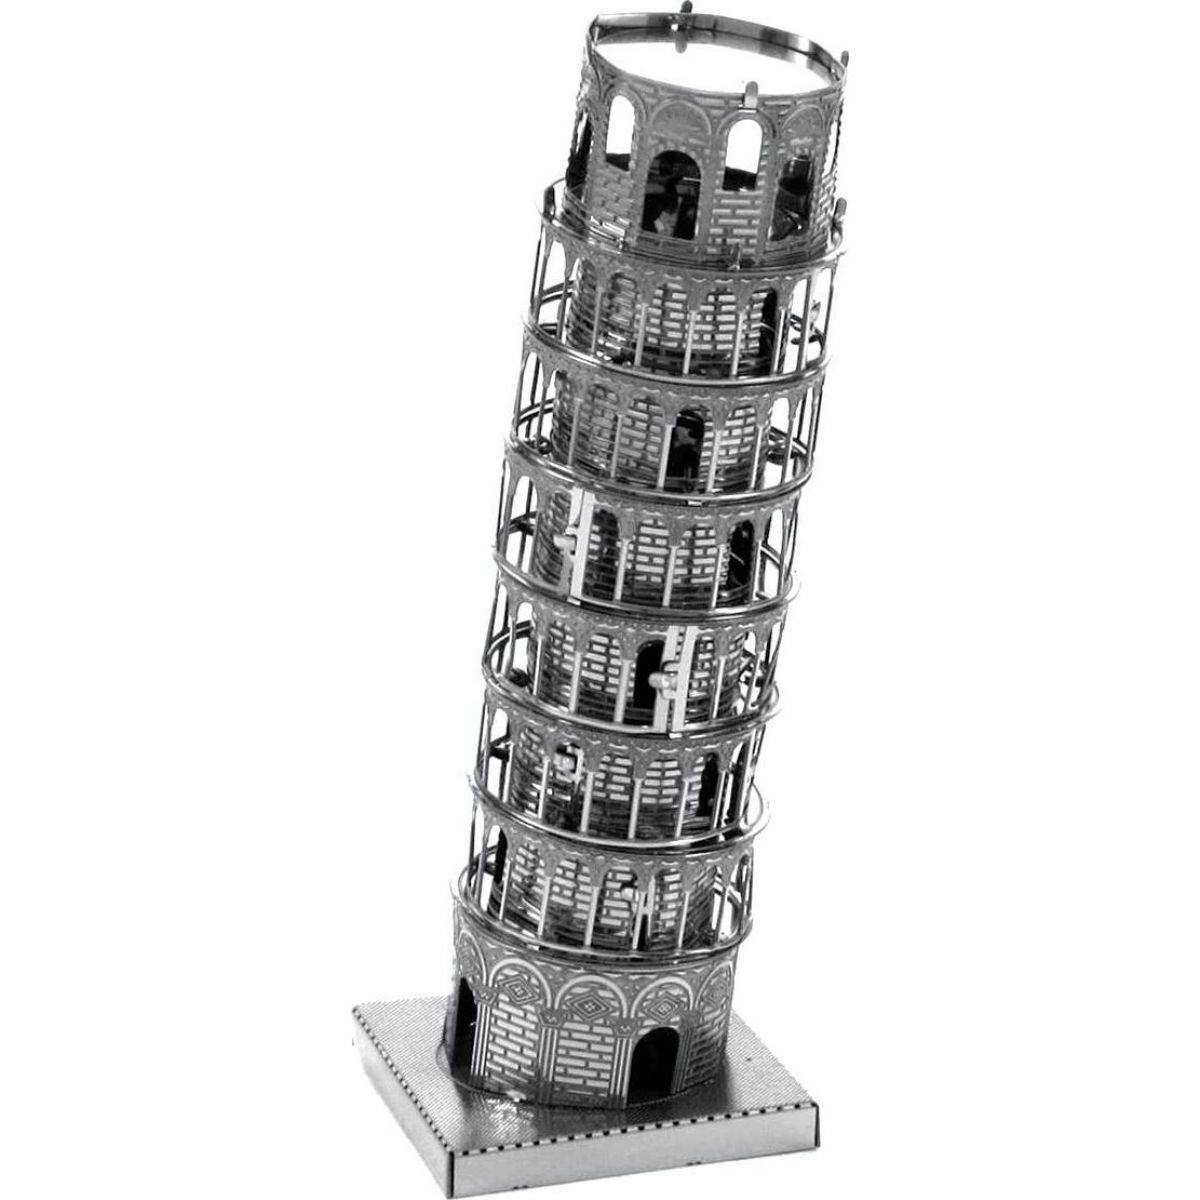 Metal Earth Tower of Pisa